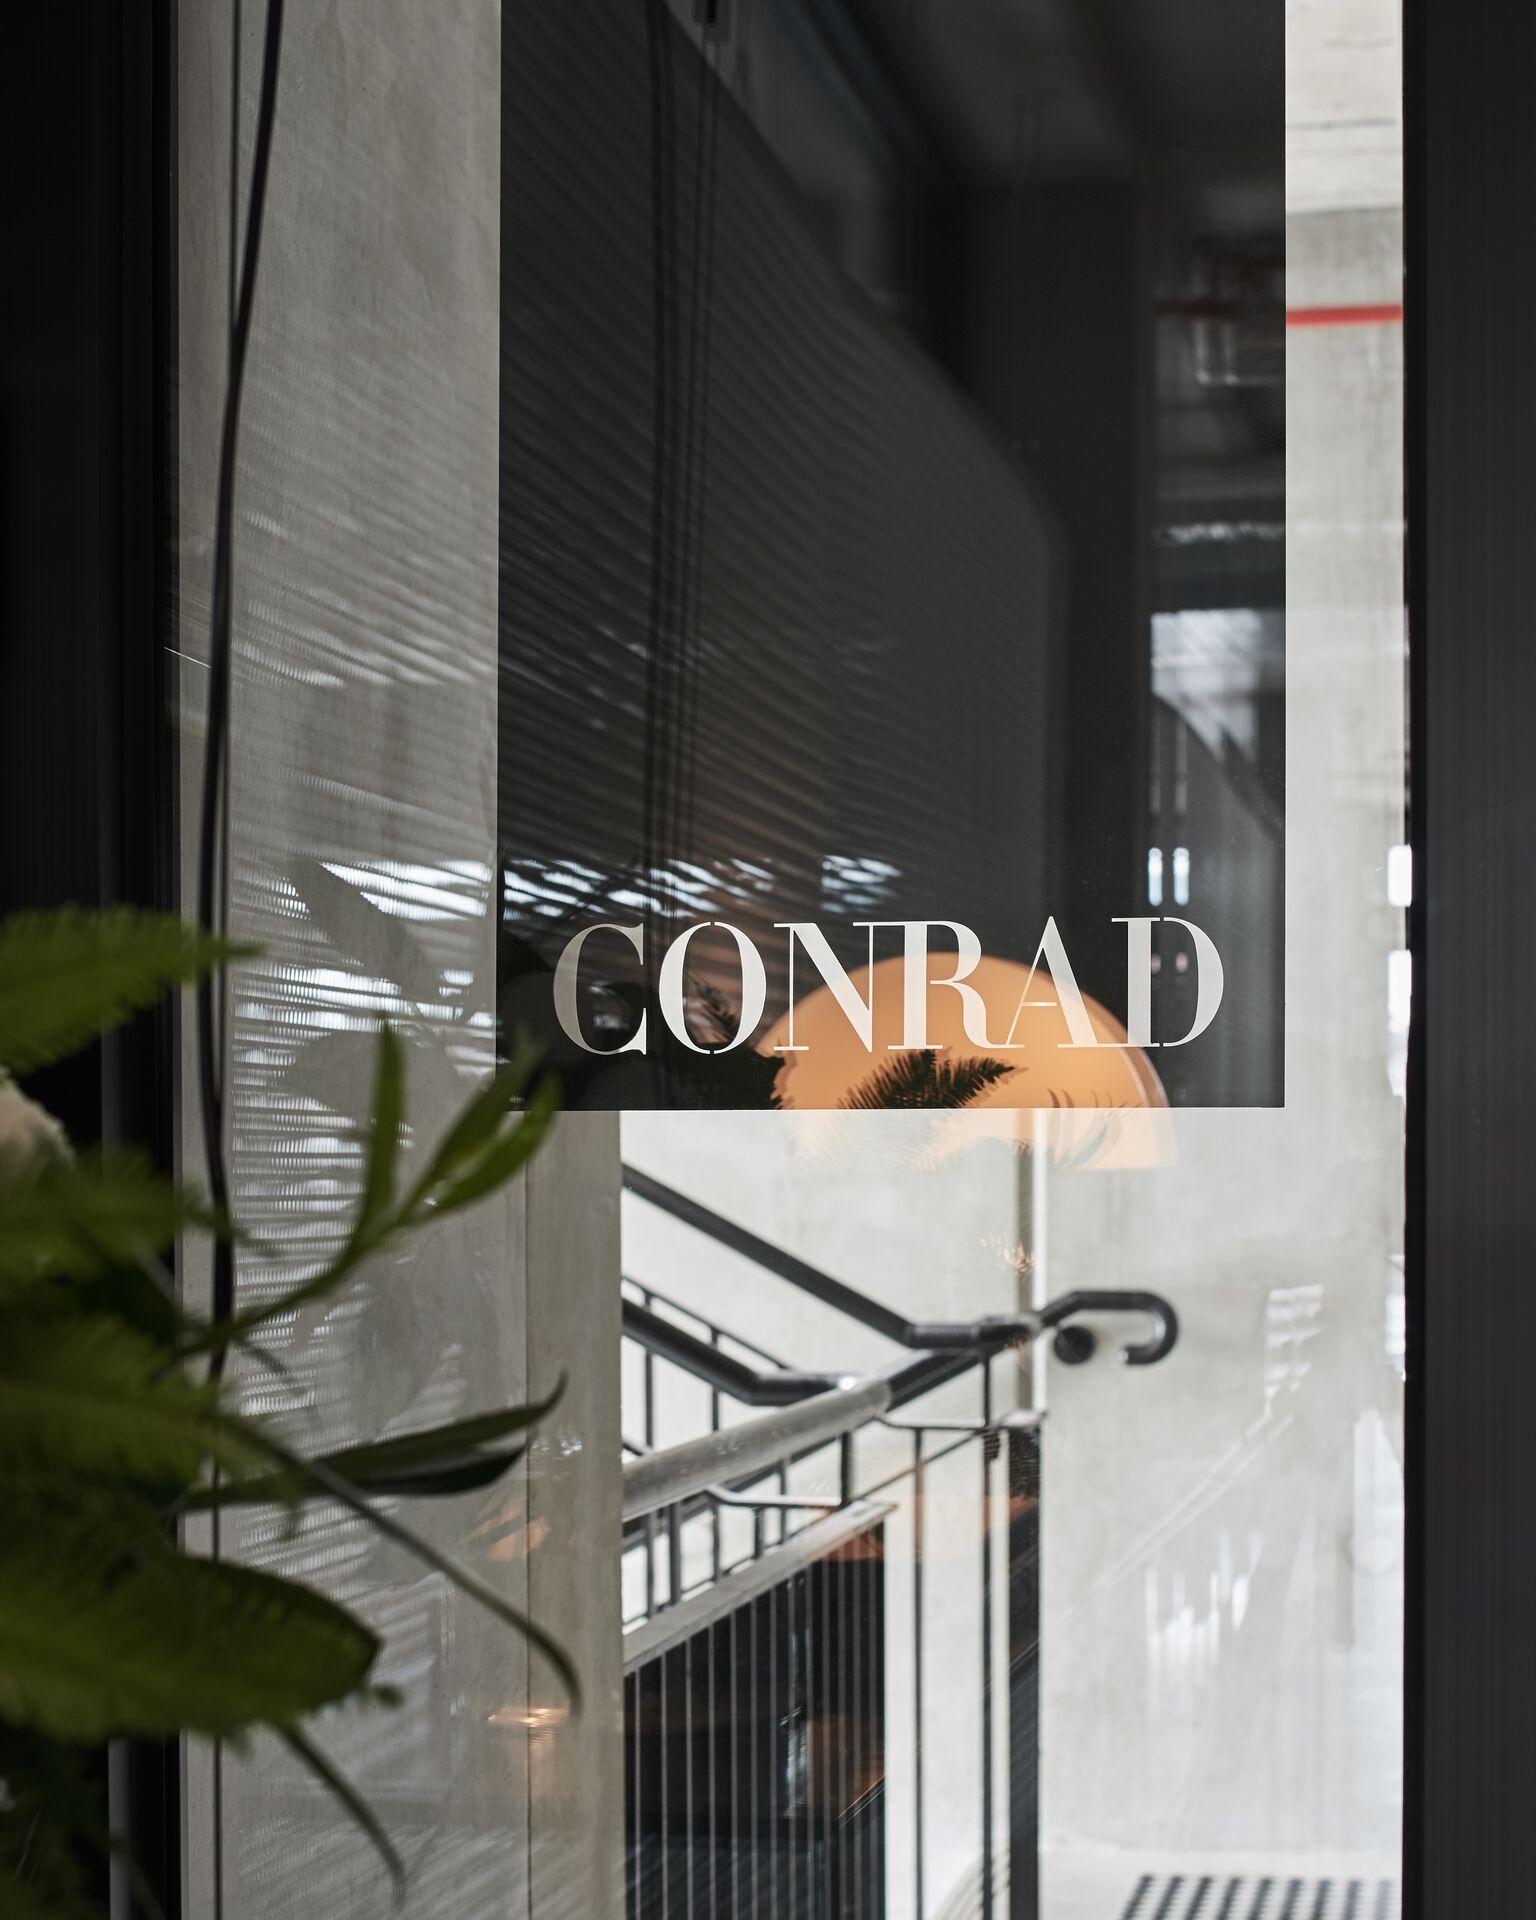 Gallery Of Conrad Architects Local Australian Residential Interior Design Cremorne, Melbourne Image 11